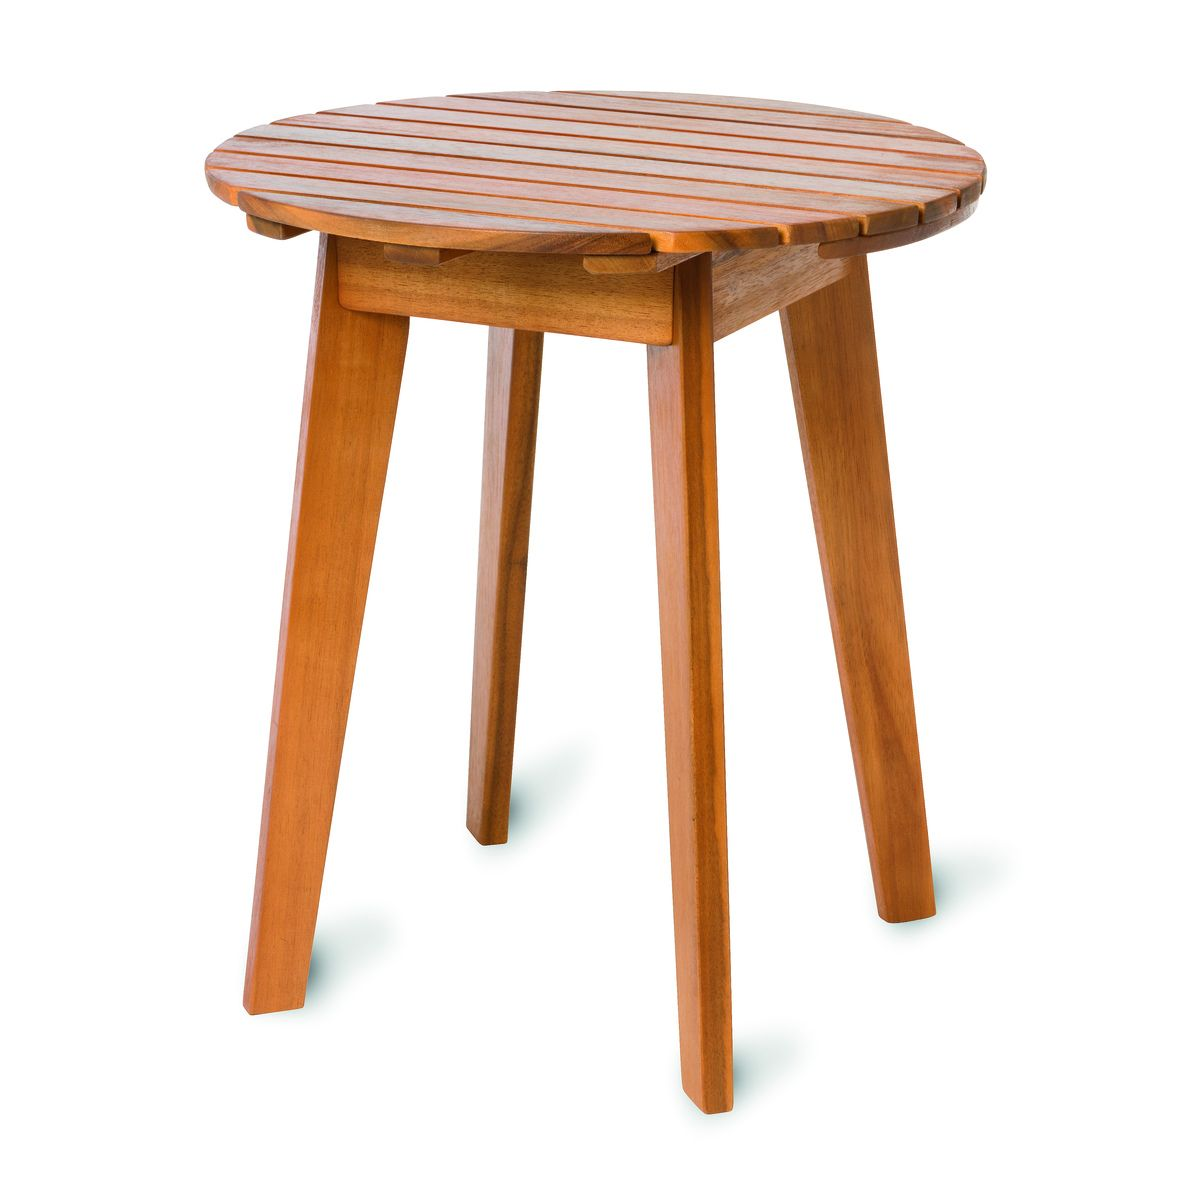 Timber side table kmart kmart inspo pinterest bedrooms timber side table kmart greentooth Choice Image